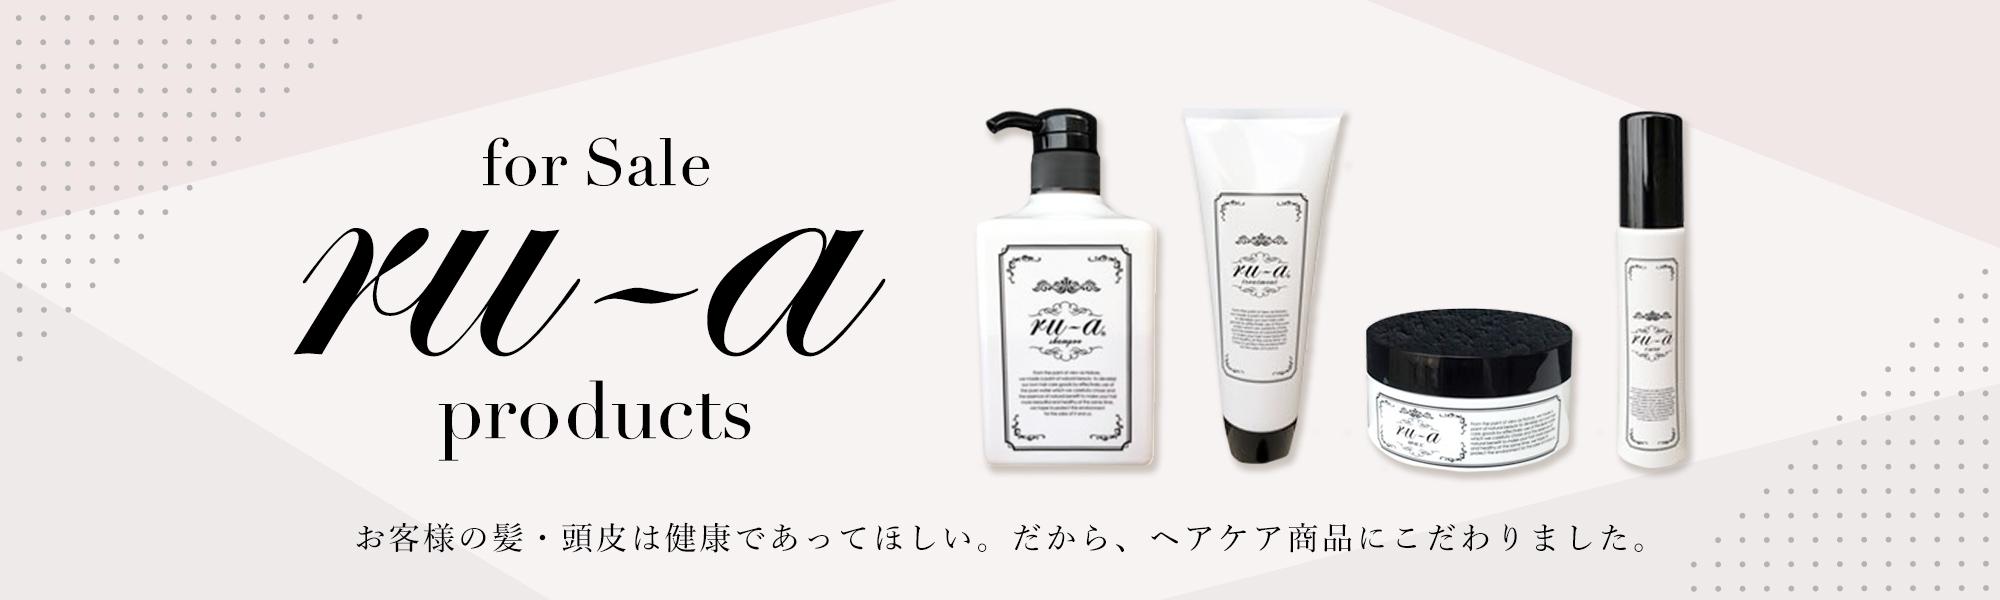 For Sale ru-a お客様の髪・頭皮は健康であってほしい。だから、ヘアケア商品にこだわりました。